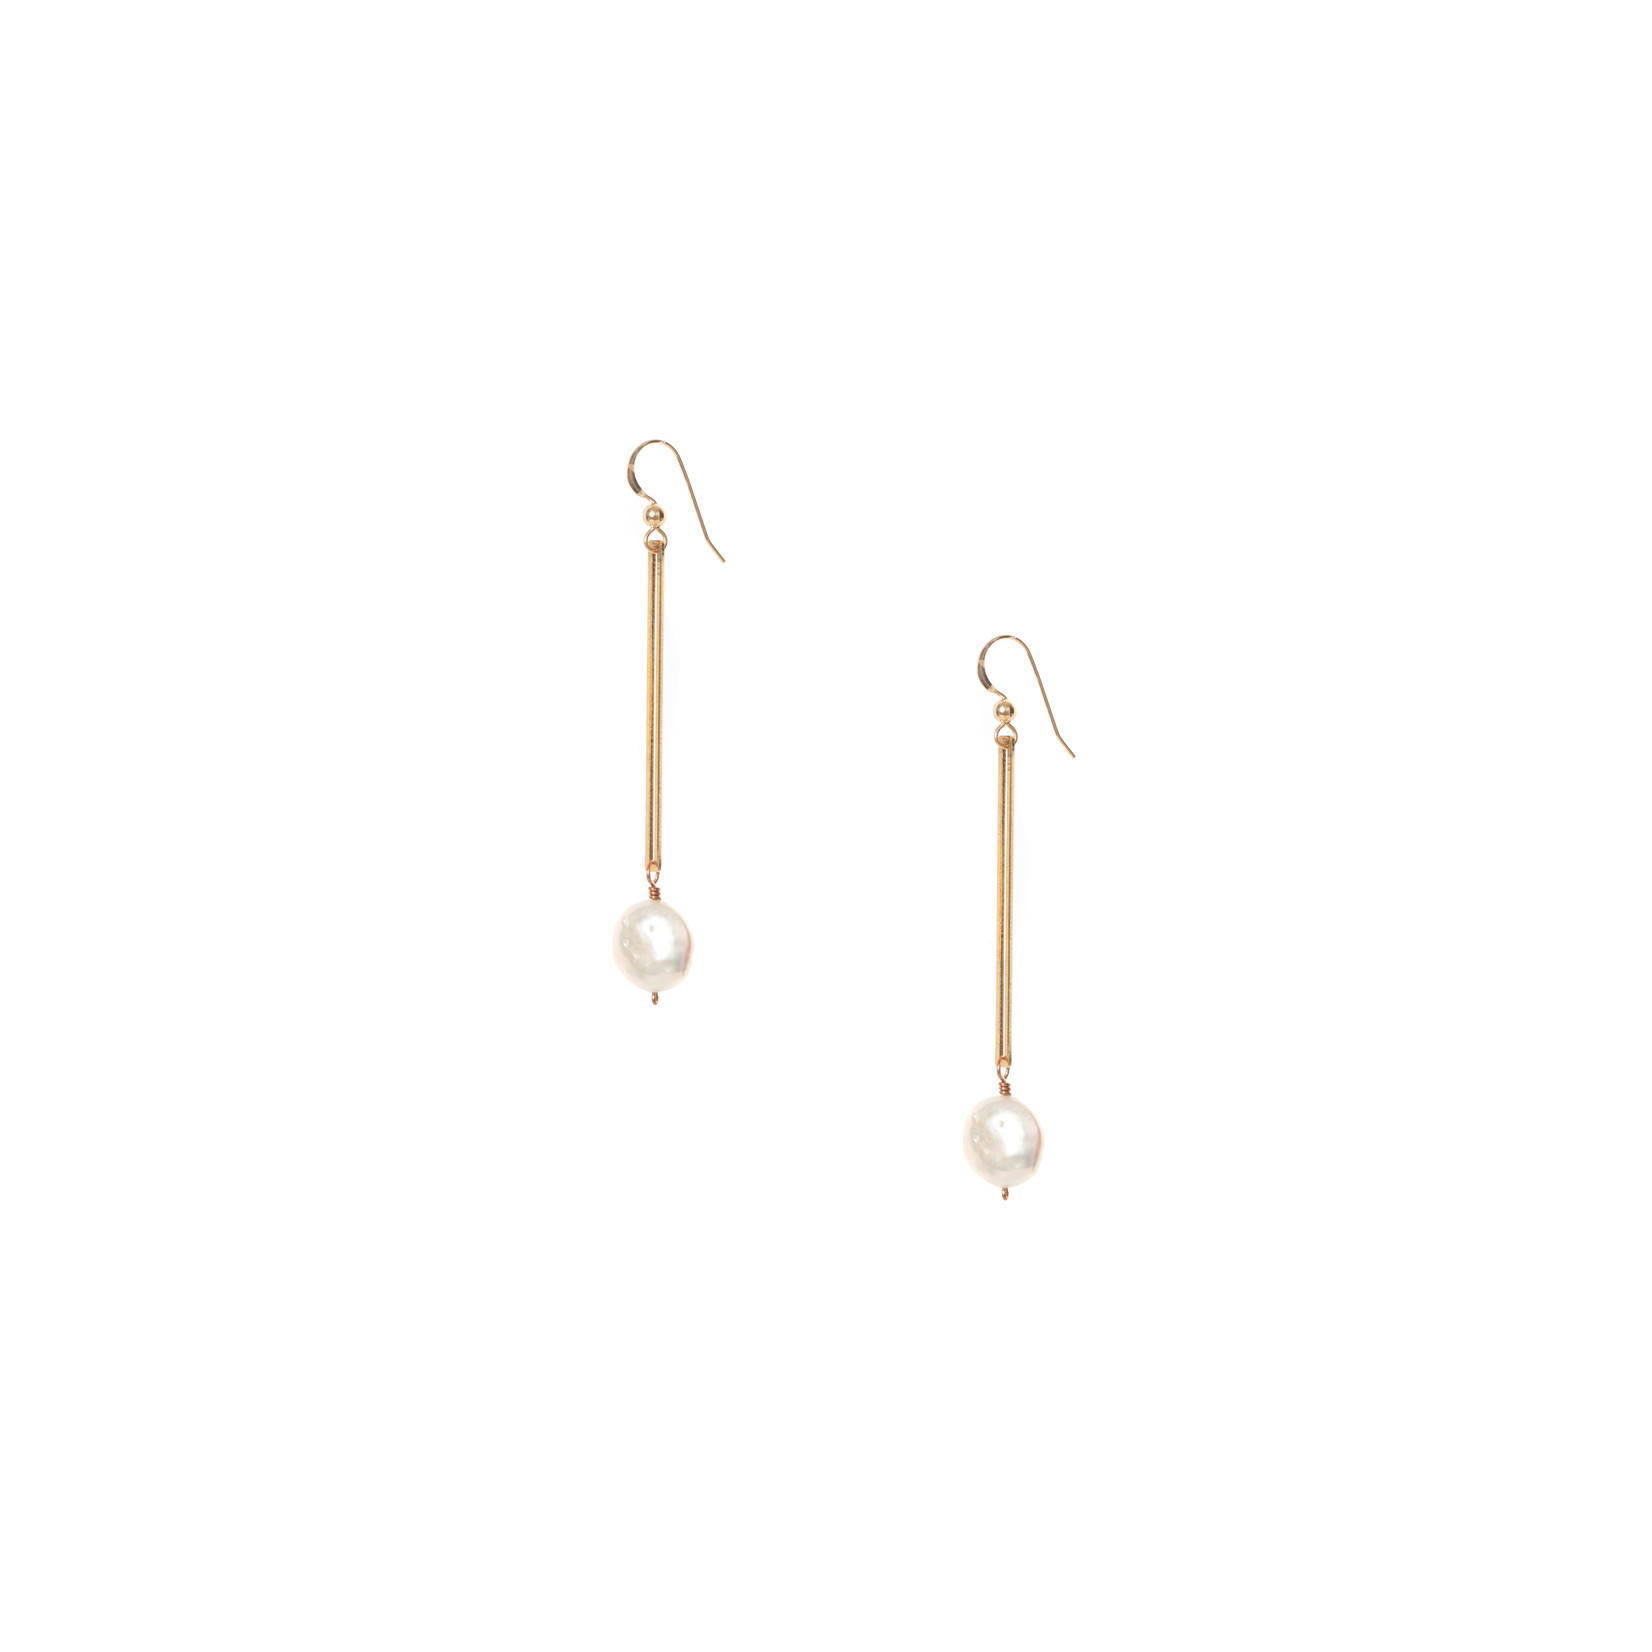 Hailey Gerrits Classic Isla Earrings